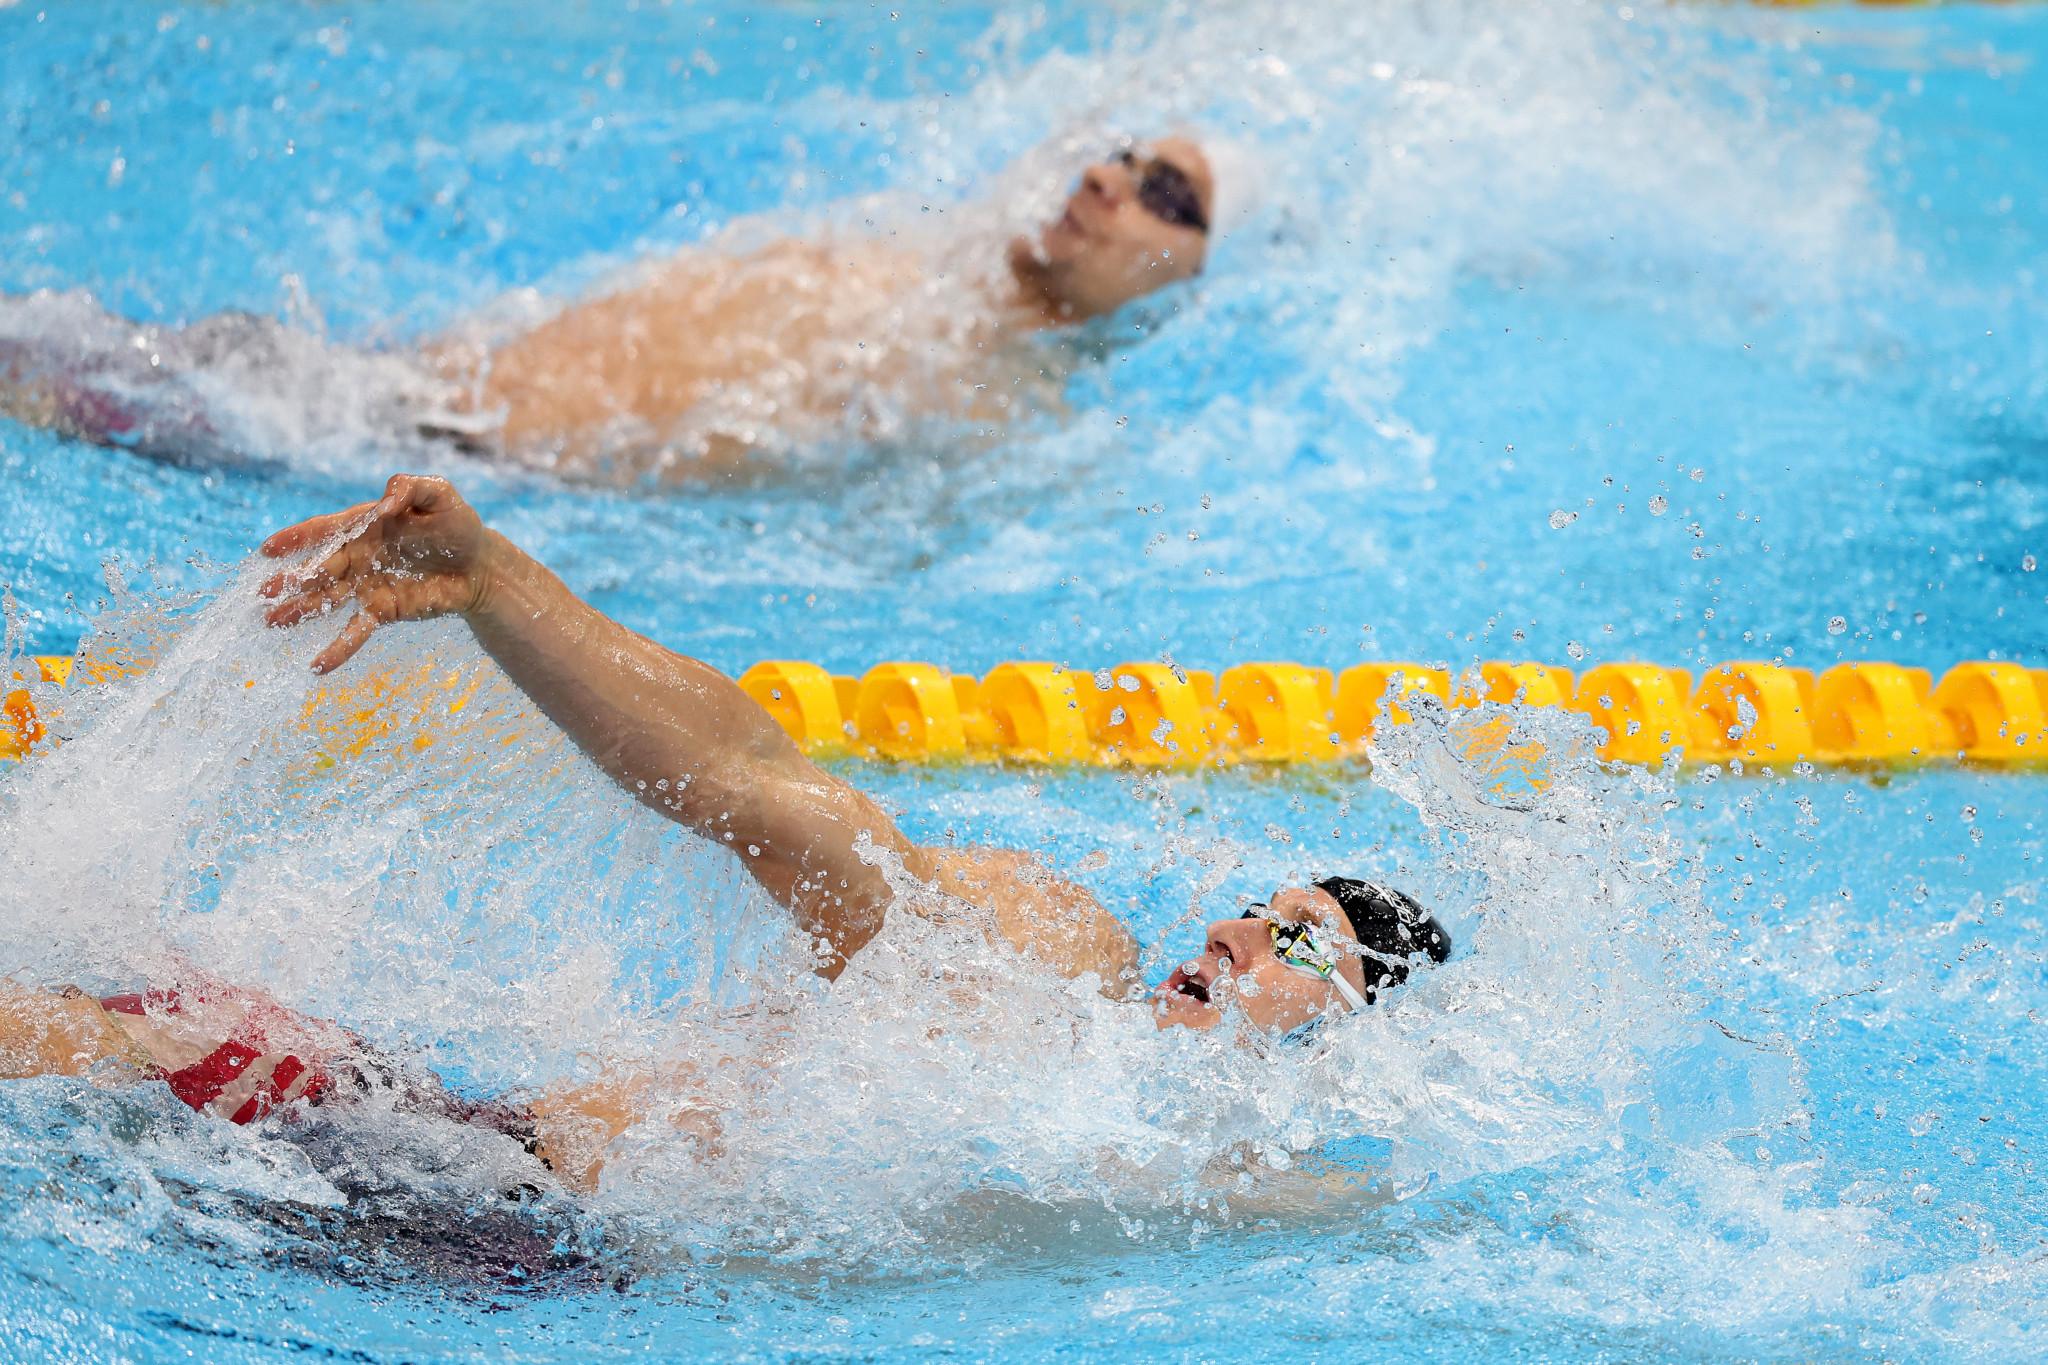 Ryan Murphy sparked debate following the men's 200m backstroke final - won by ROC's Evgeny Rulov - when he said